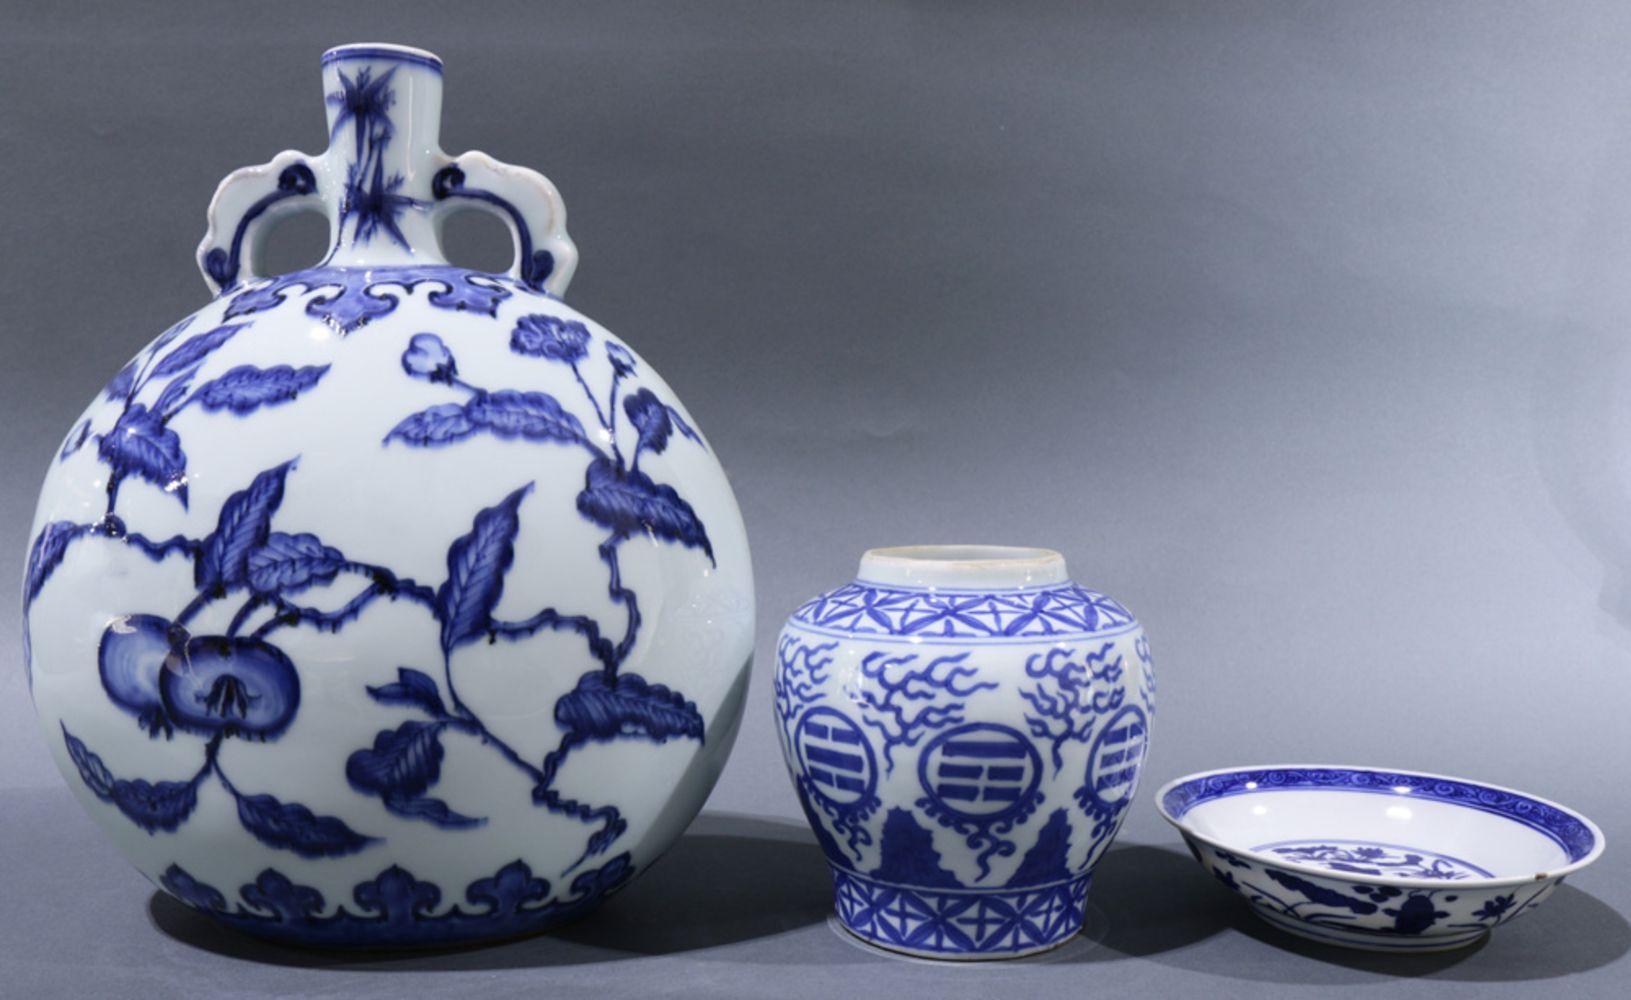 February Fine Art, Furniture, Decoratives, Jewelery, and Asian Art Auction